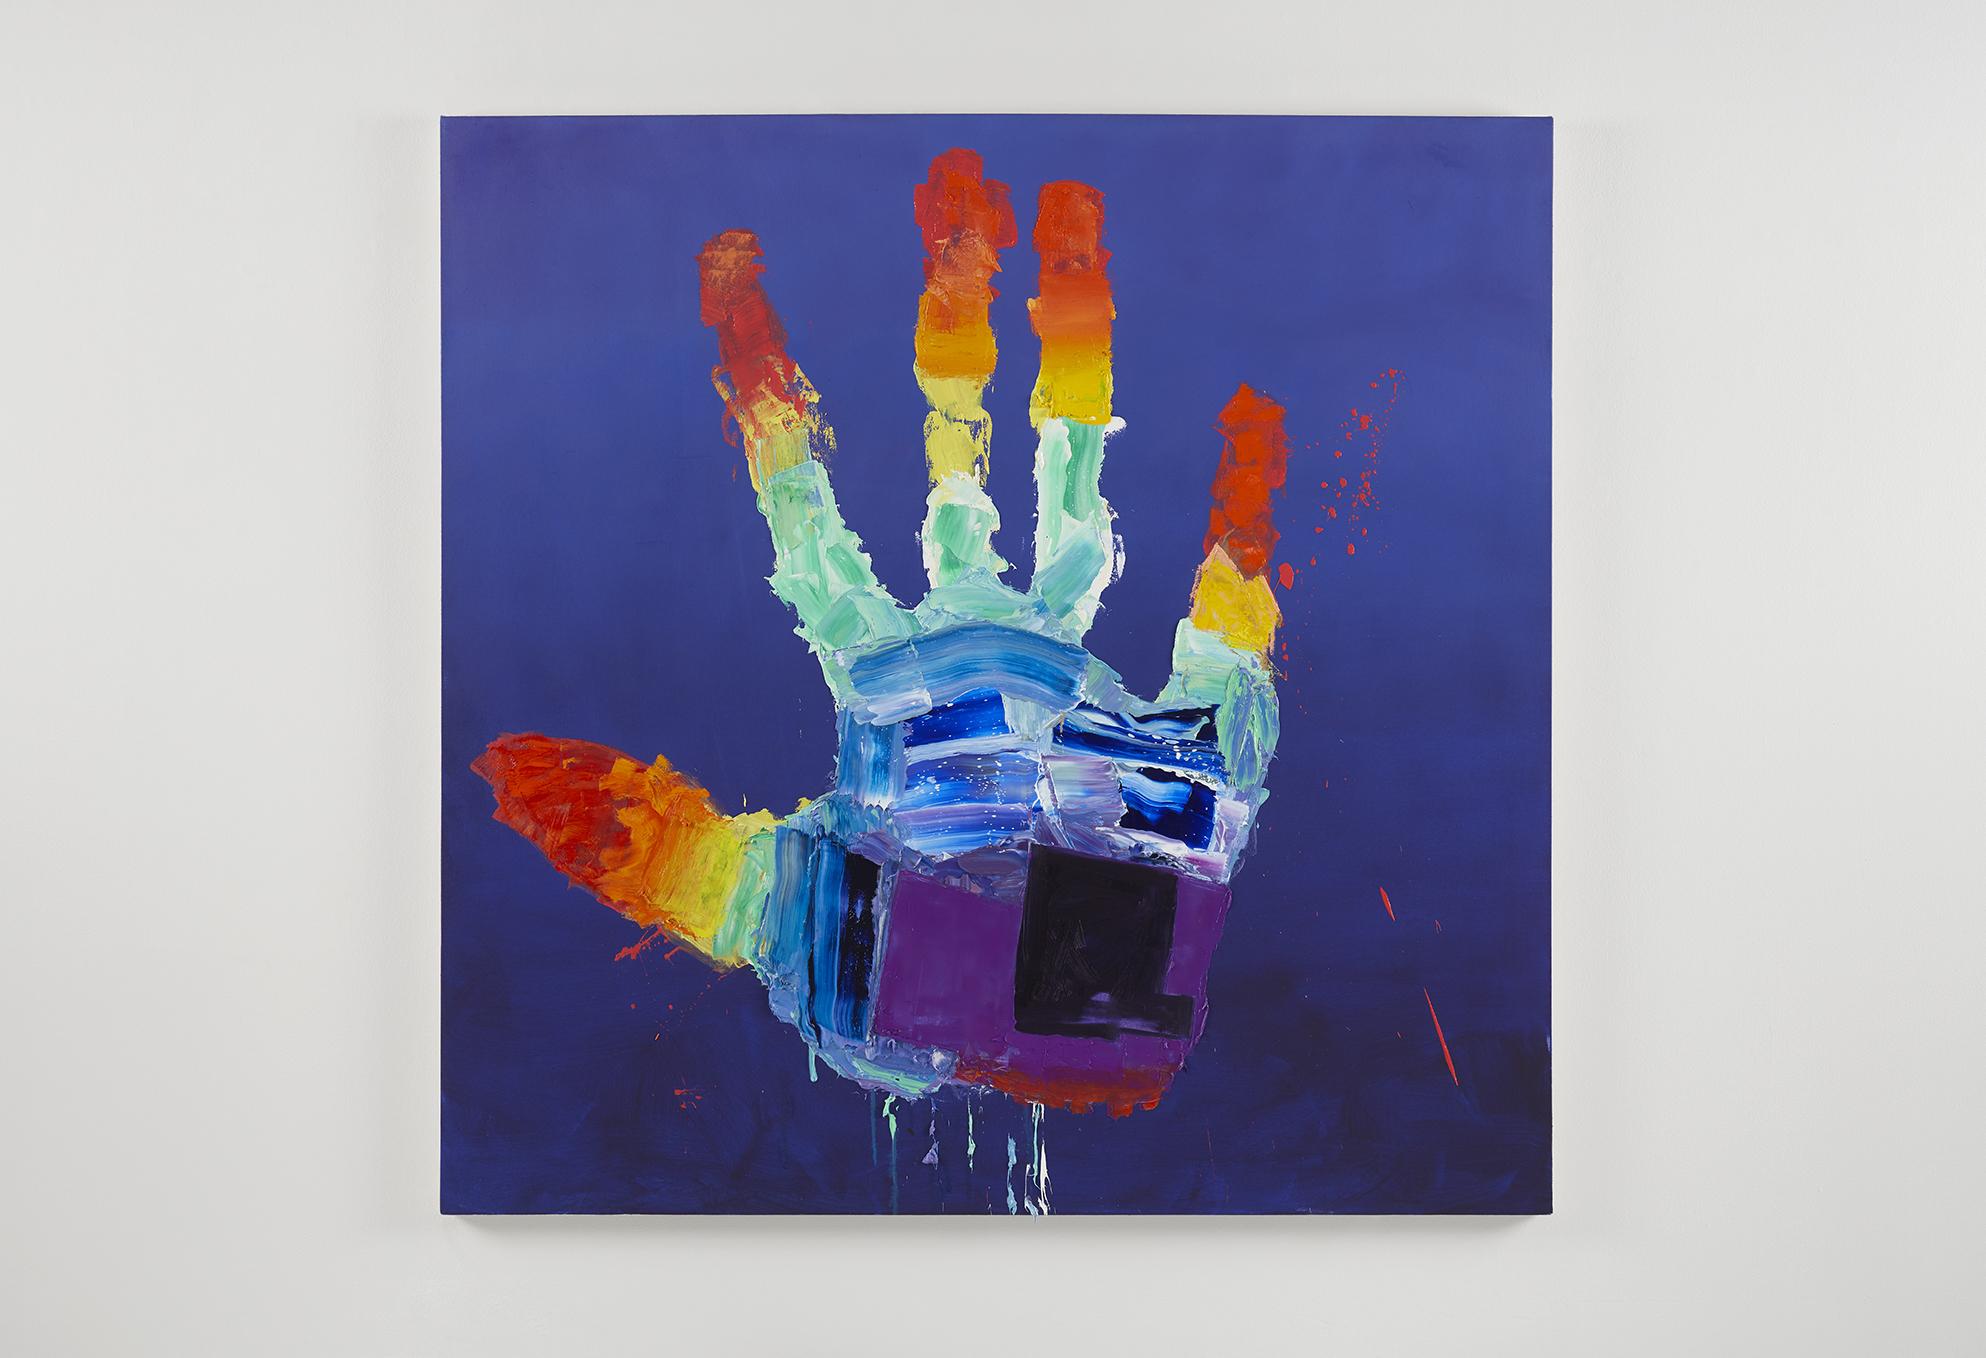 Alexander Kroll, Rainbow super power hand, 2017 oil on canvas 152,4 x 152,4 cm - 60 x 60 inches